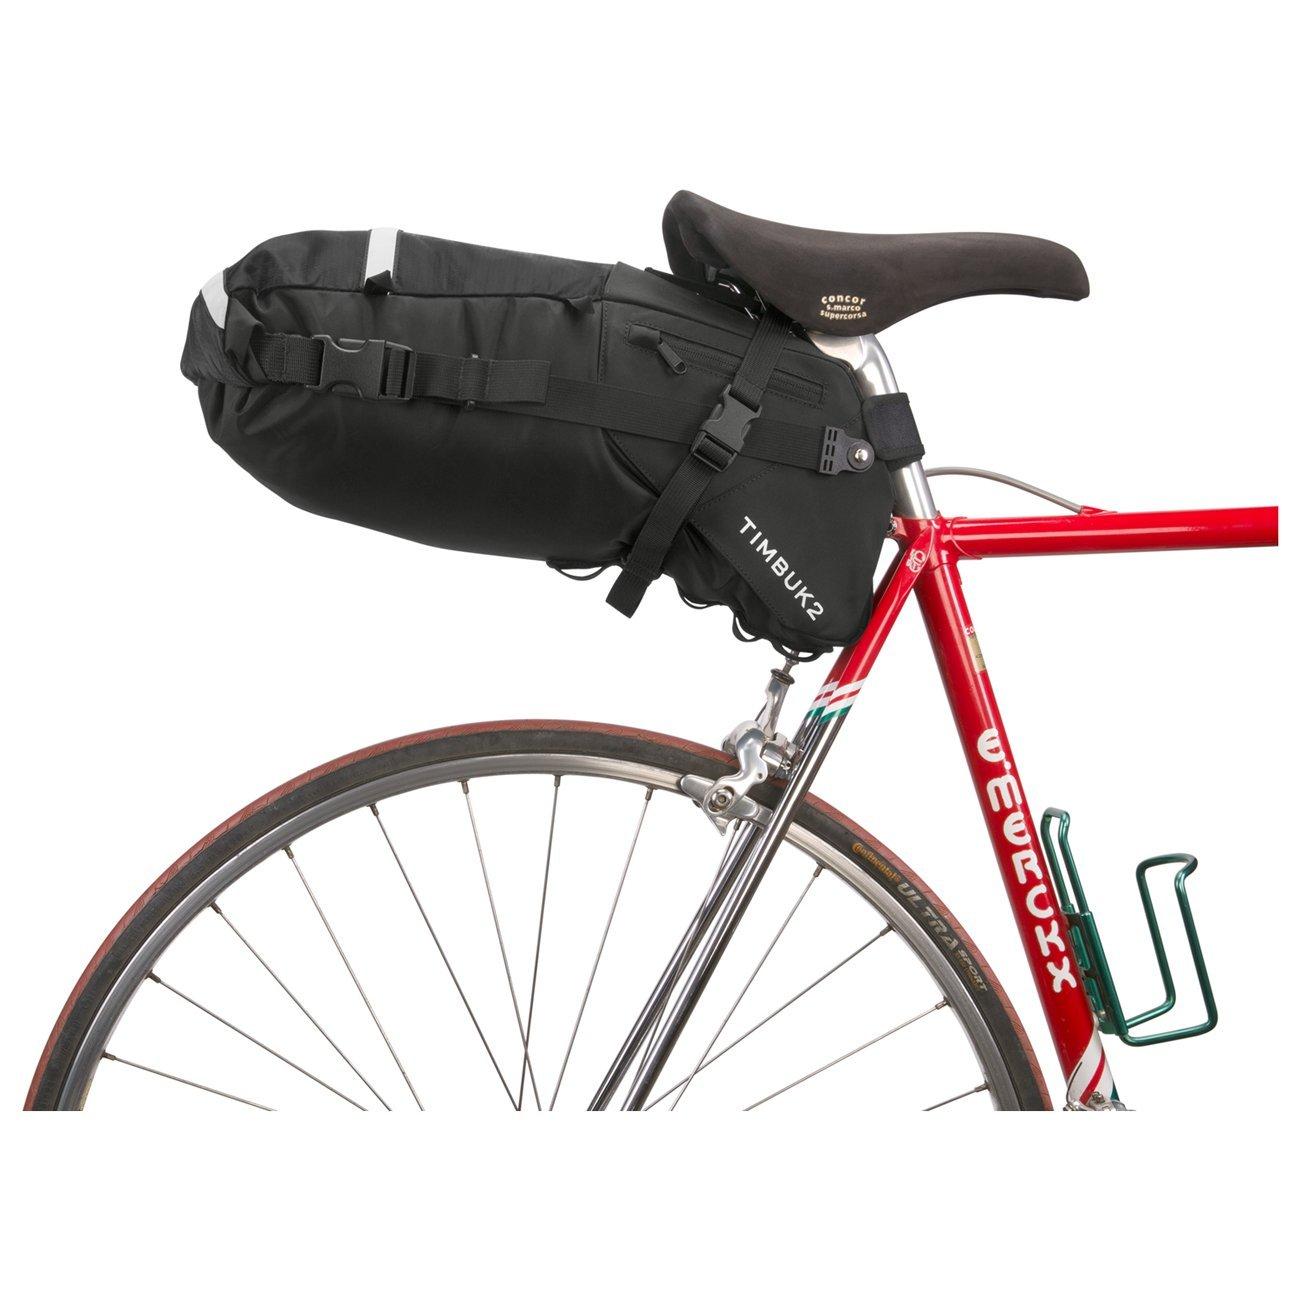 Timbuk2 Sonoma Seat Pack Sports Outdoors